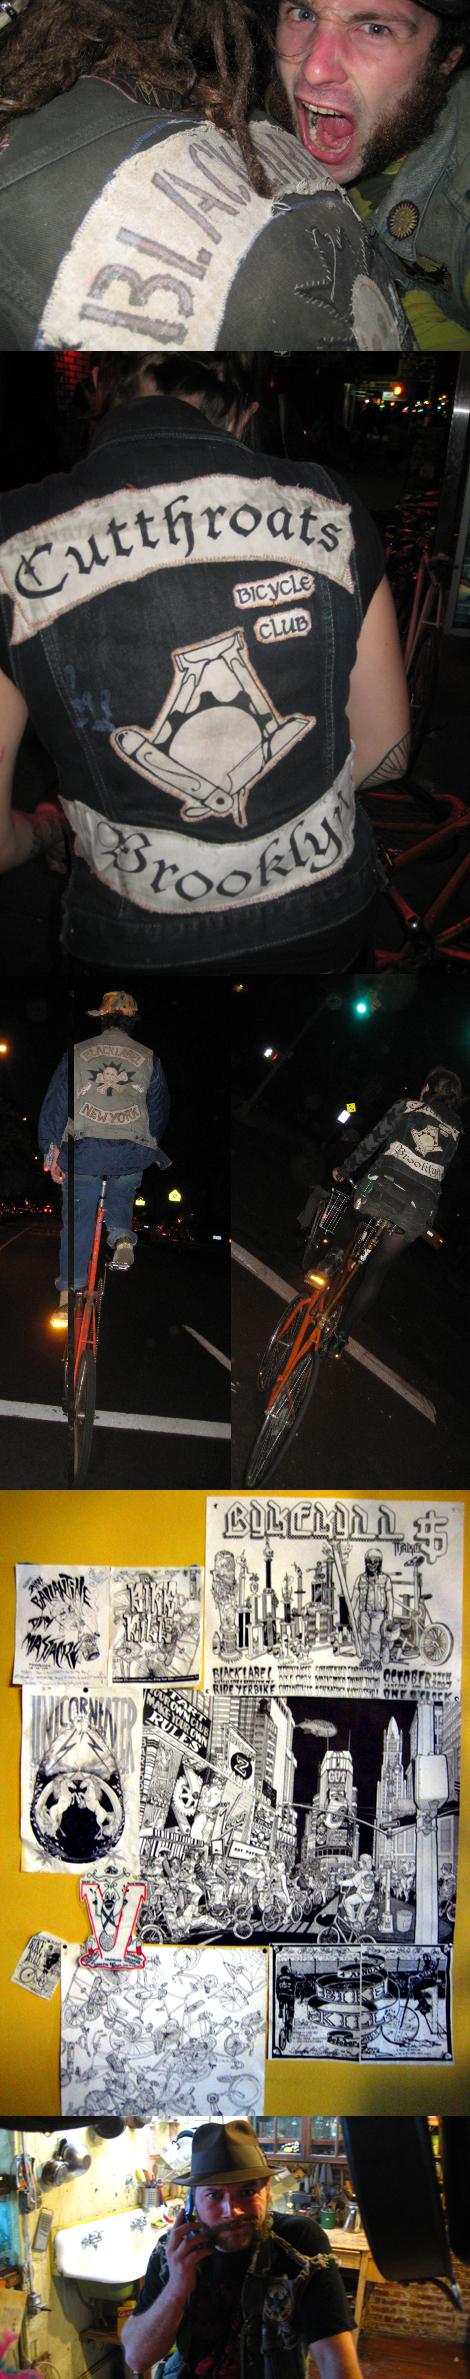 Black Label Bike Club